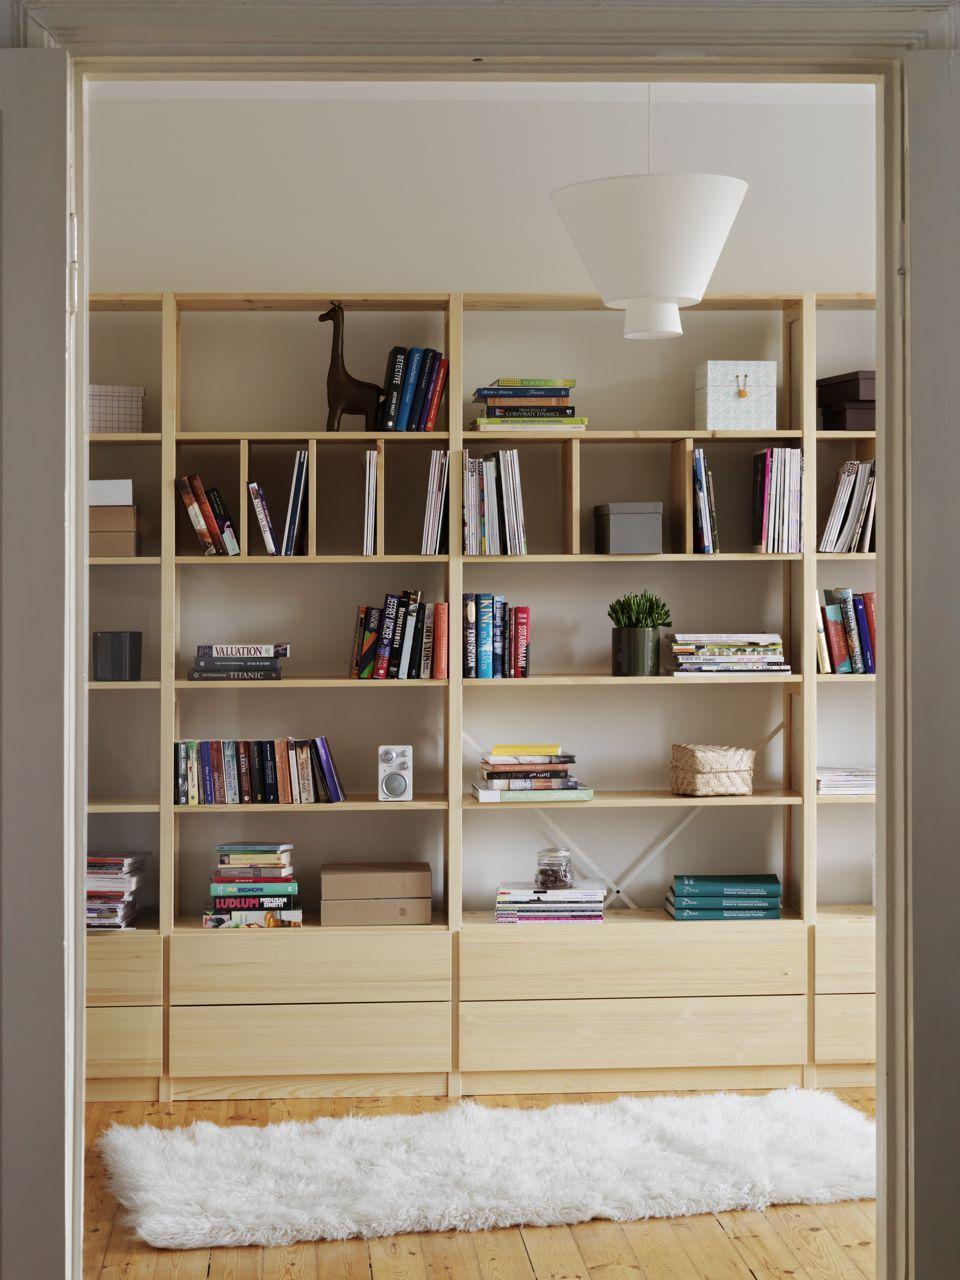 Lundia classic bookshelfs pinterest guardar juguetes - Estanterias guardar juguetes ...